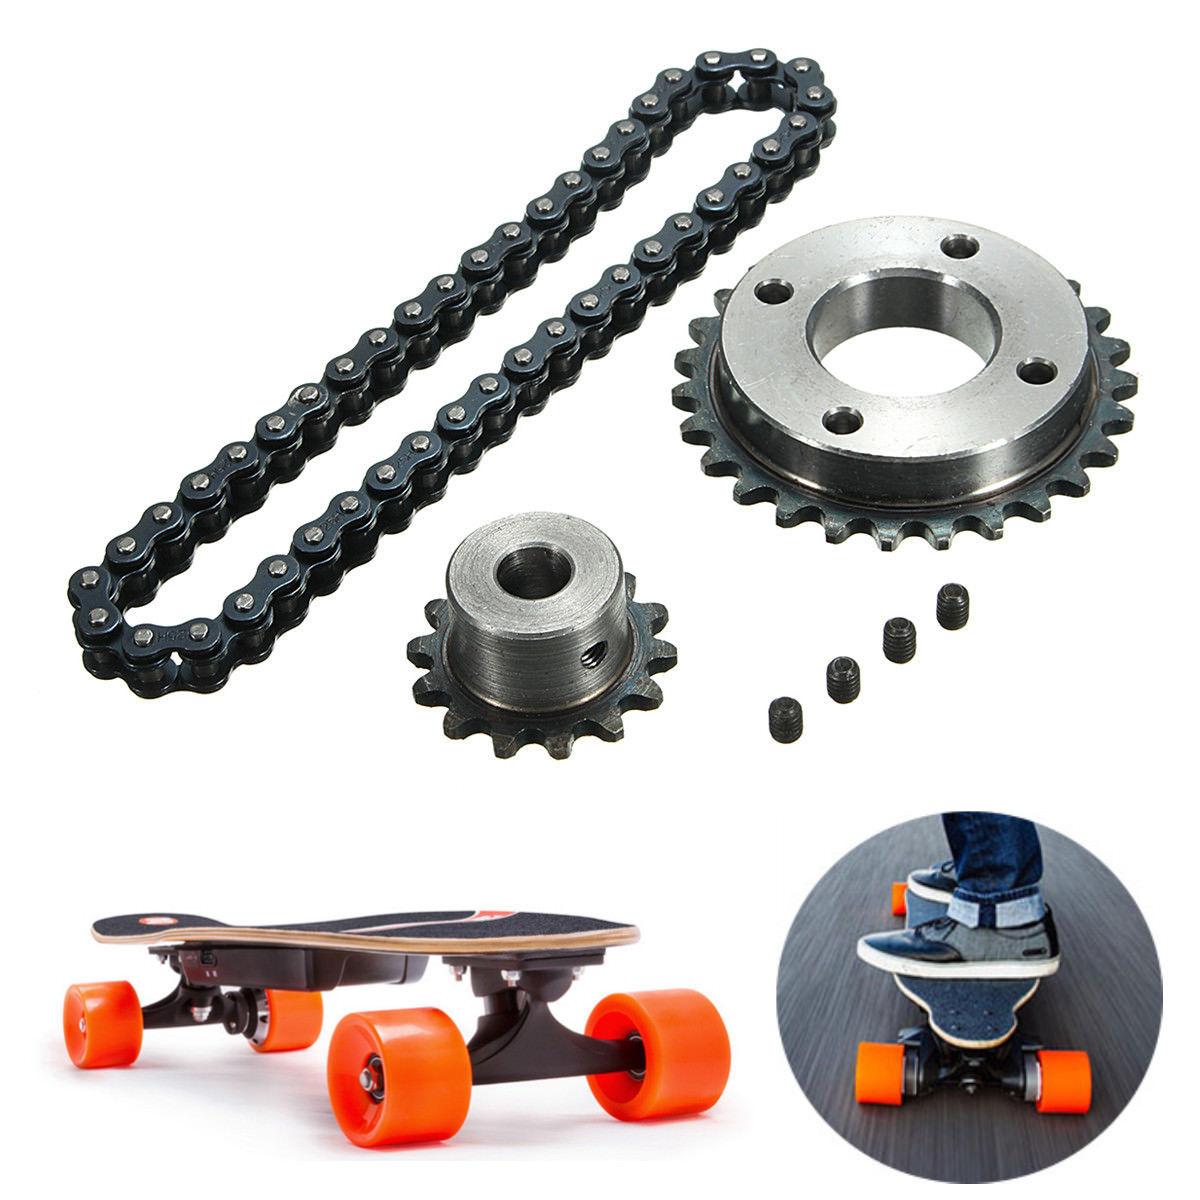 NO Sprocket Chain Wheel For DIY Electric Longboard Skateboard Parts Repalcement DIY